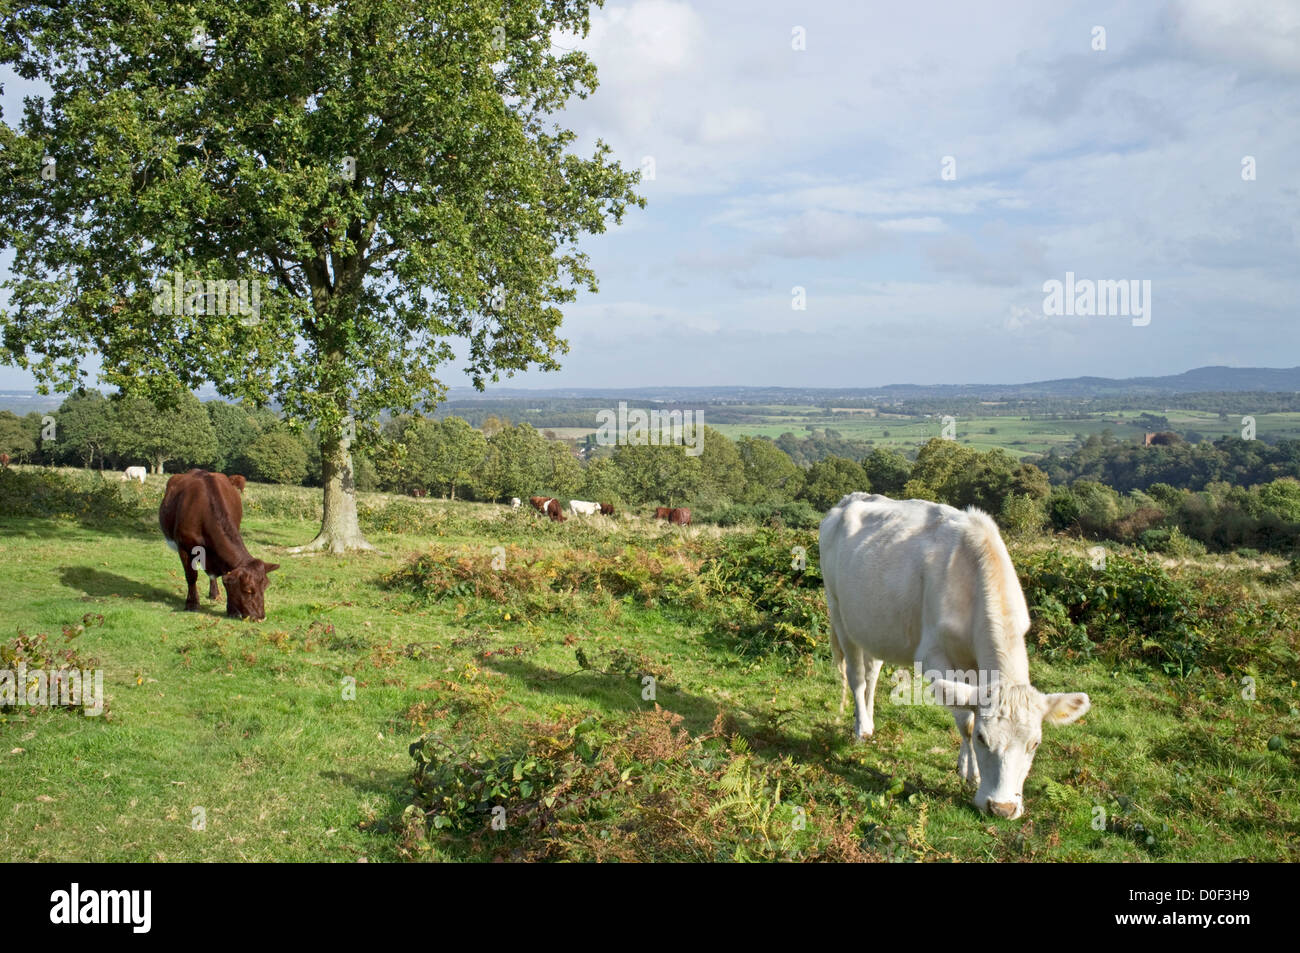 Short Horn cattle grazing on the National Trust's Kinver Edge, Kinver, Staffordshire, England, UK - Stock Image